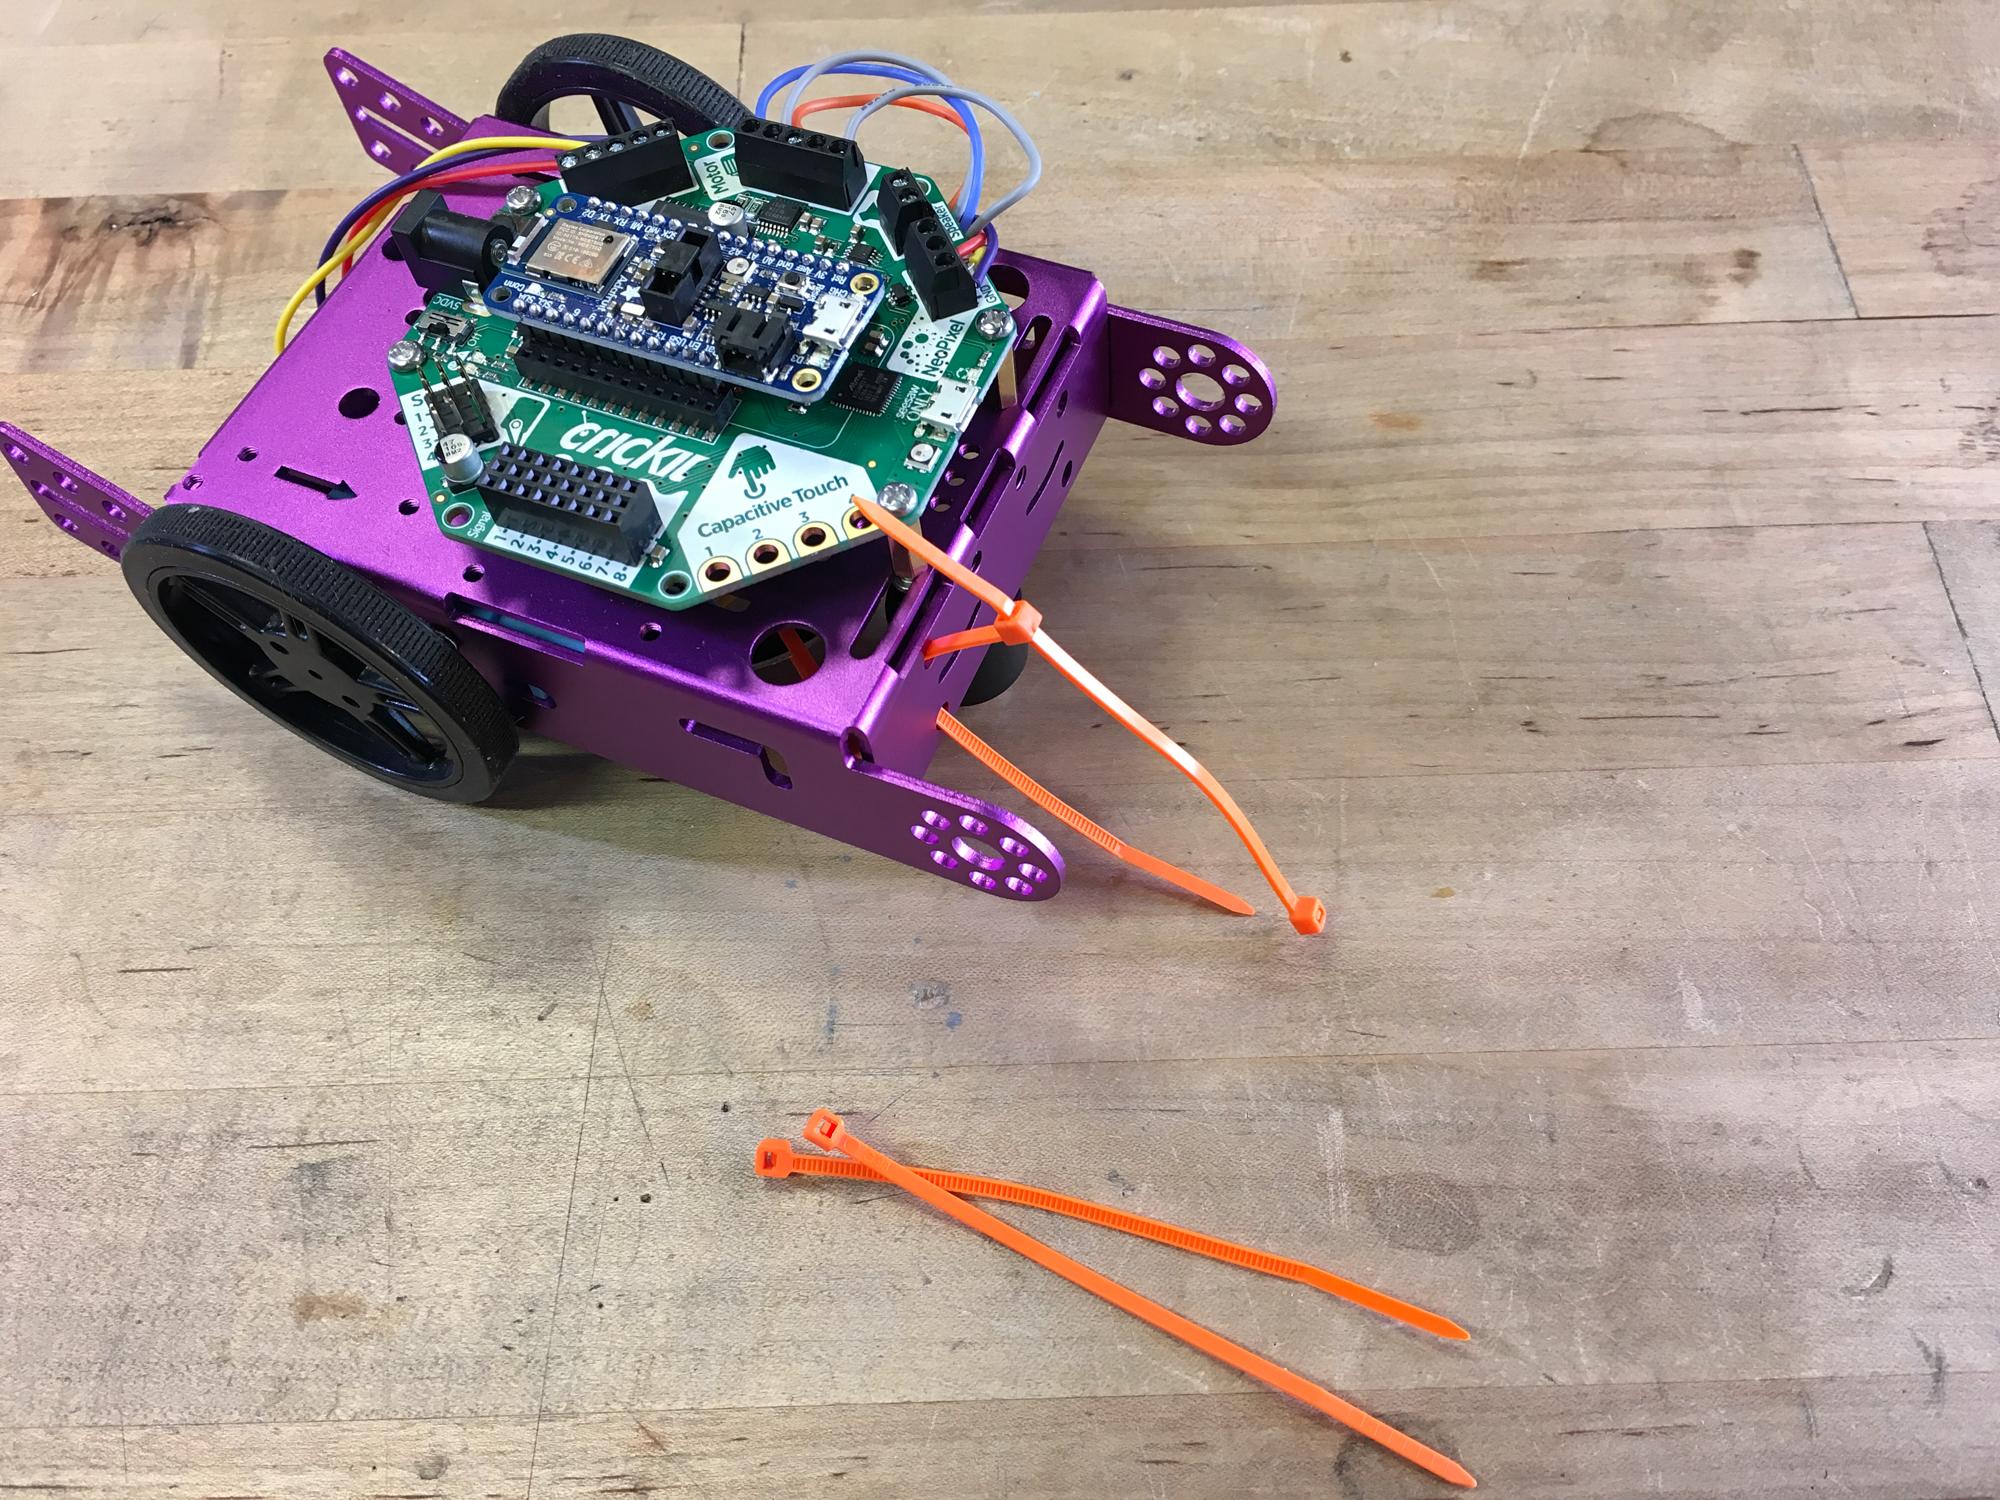 robotics___cnc_IMG_6592_2k.jpg